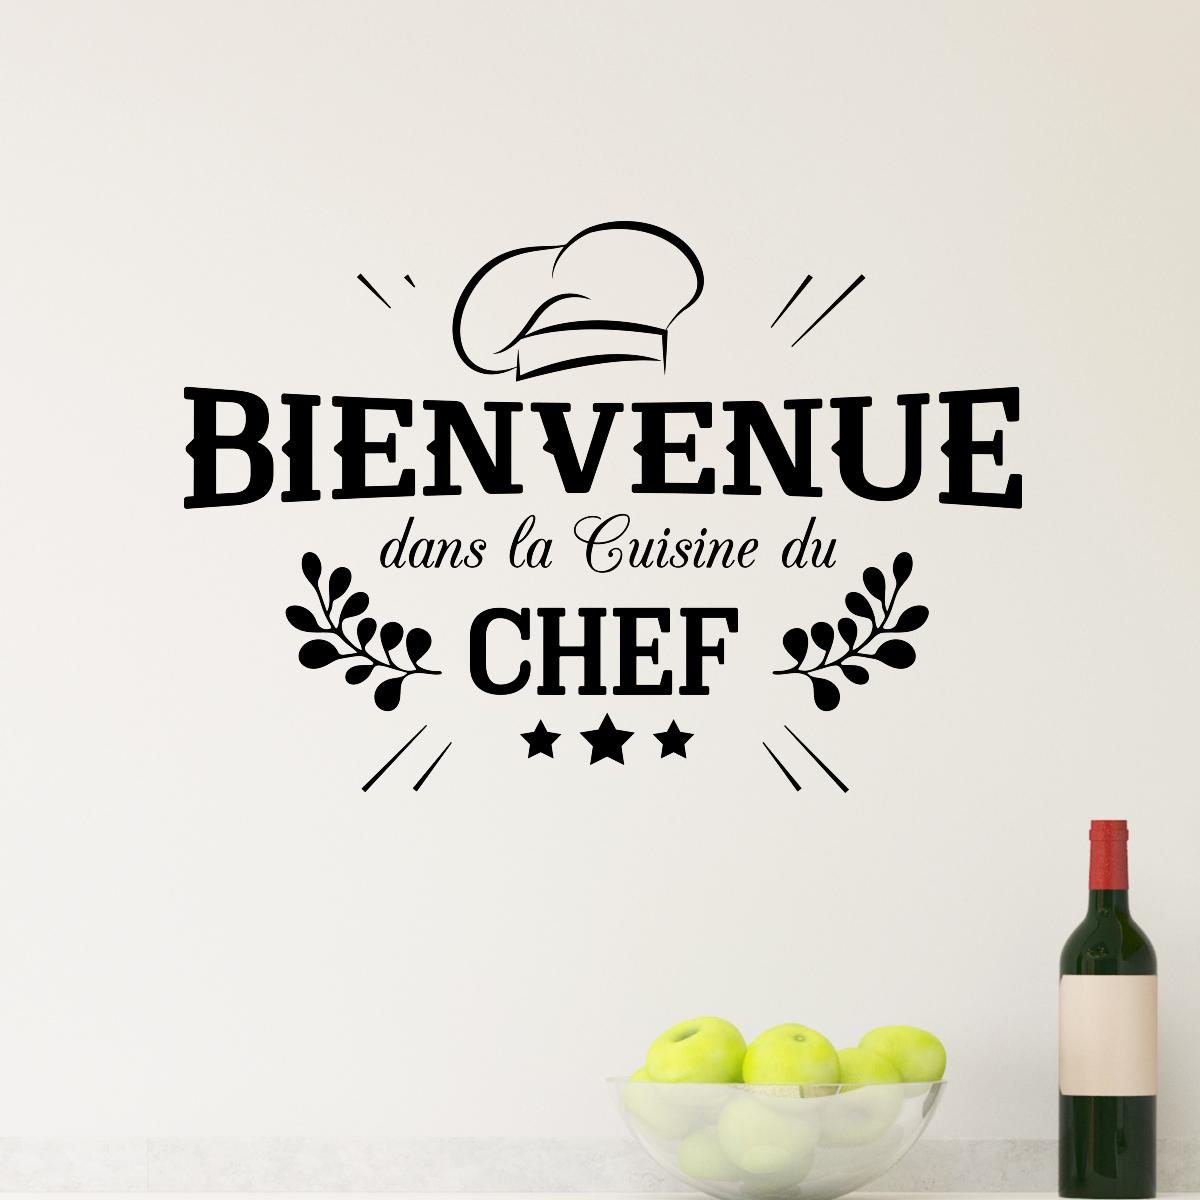 sticker bienvenue cuisine du chef stickers stickers. Black Bedroom Furniture Sets. Home Design Ideas